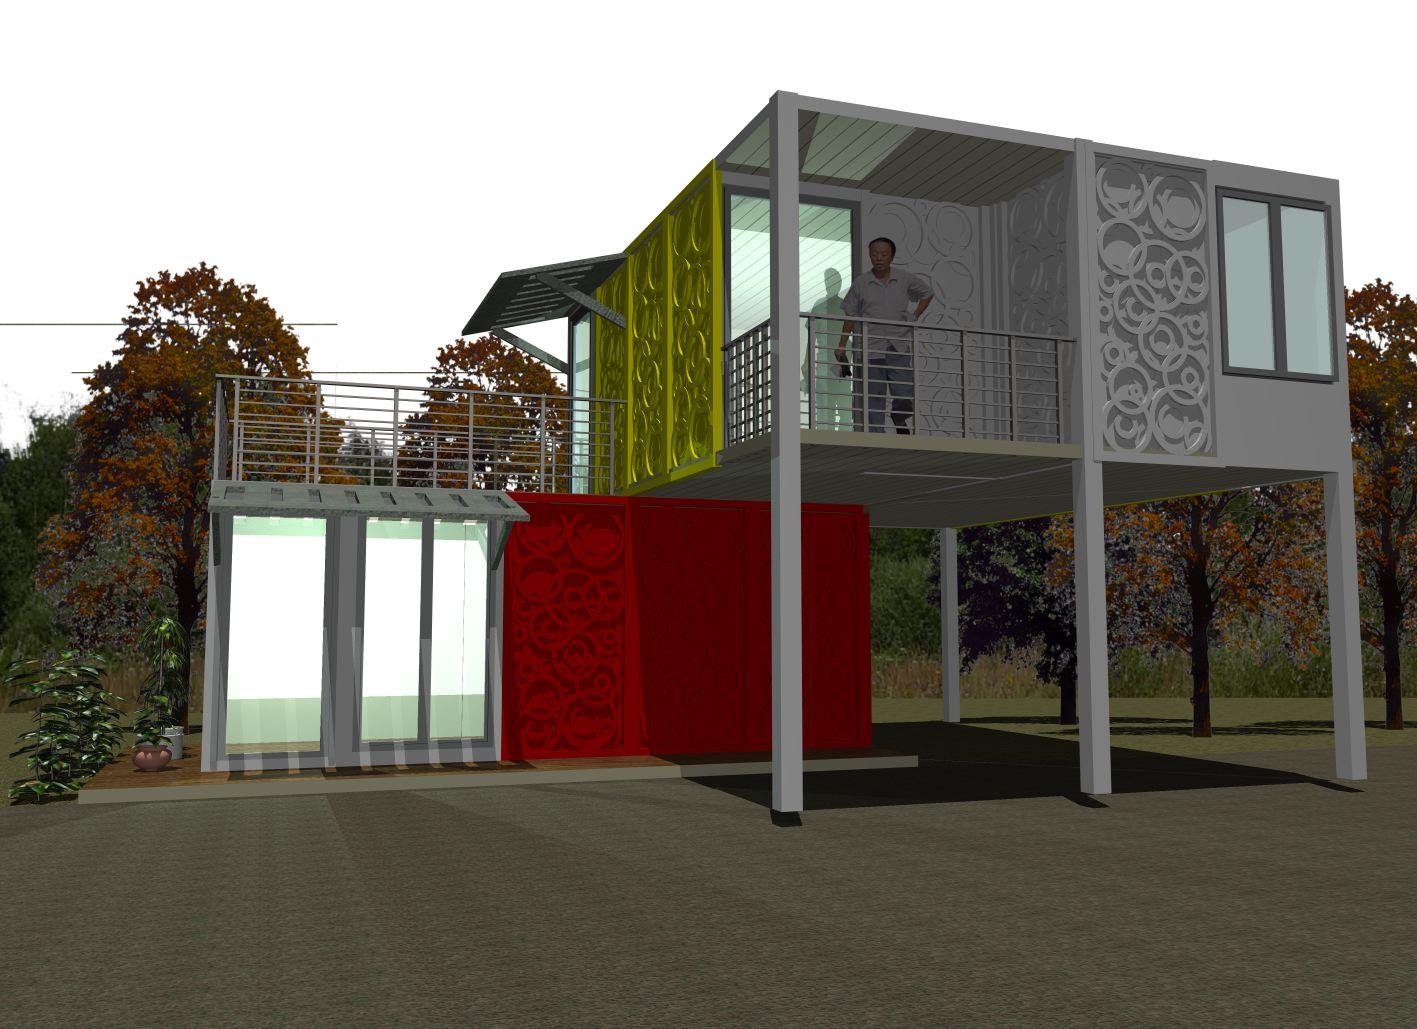 1000 images about casas hechas con contenedores on pinterest - Casa hecha de contenedores ...